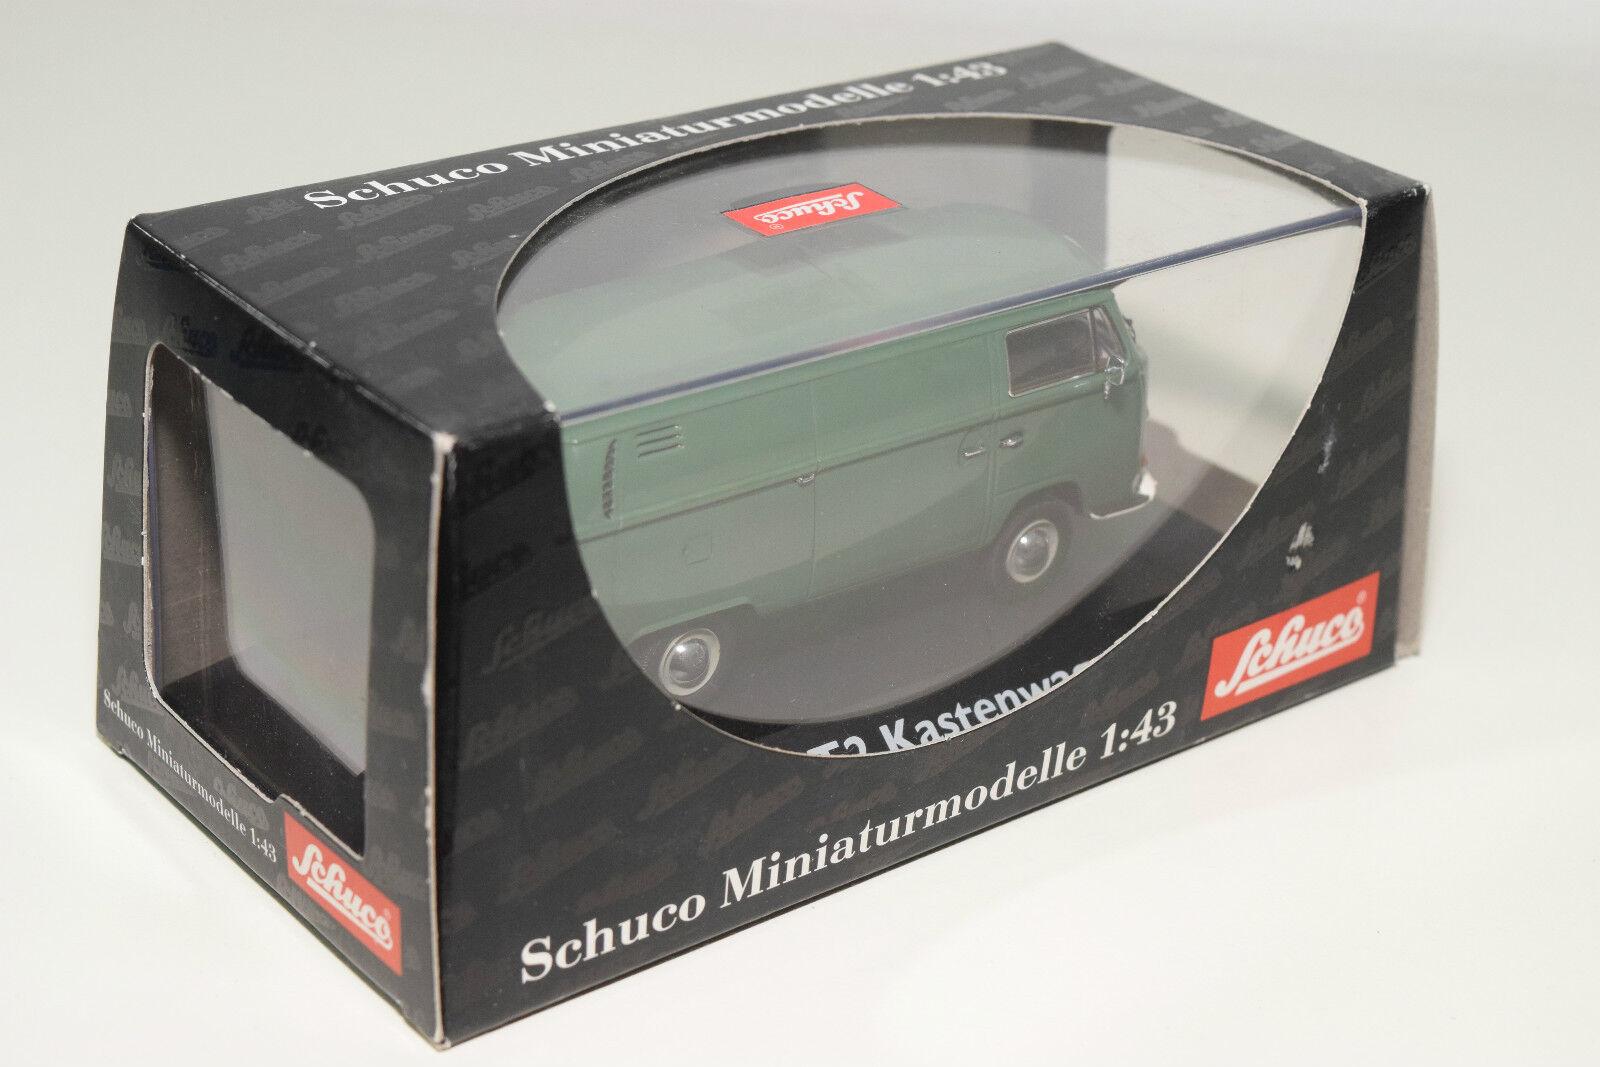 . . . SCHUCO 3211 VW VOLKSWAGEN TRANSPORTER T2 KASTENWAGEN VAN GREEN MINT BOXED a982a9